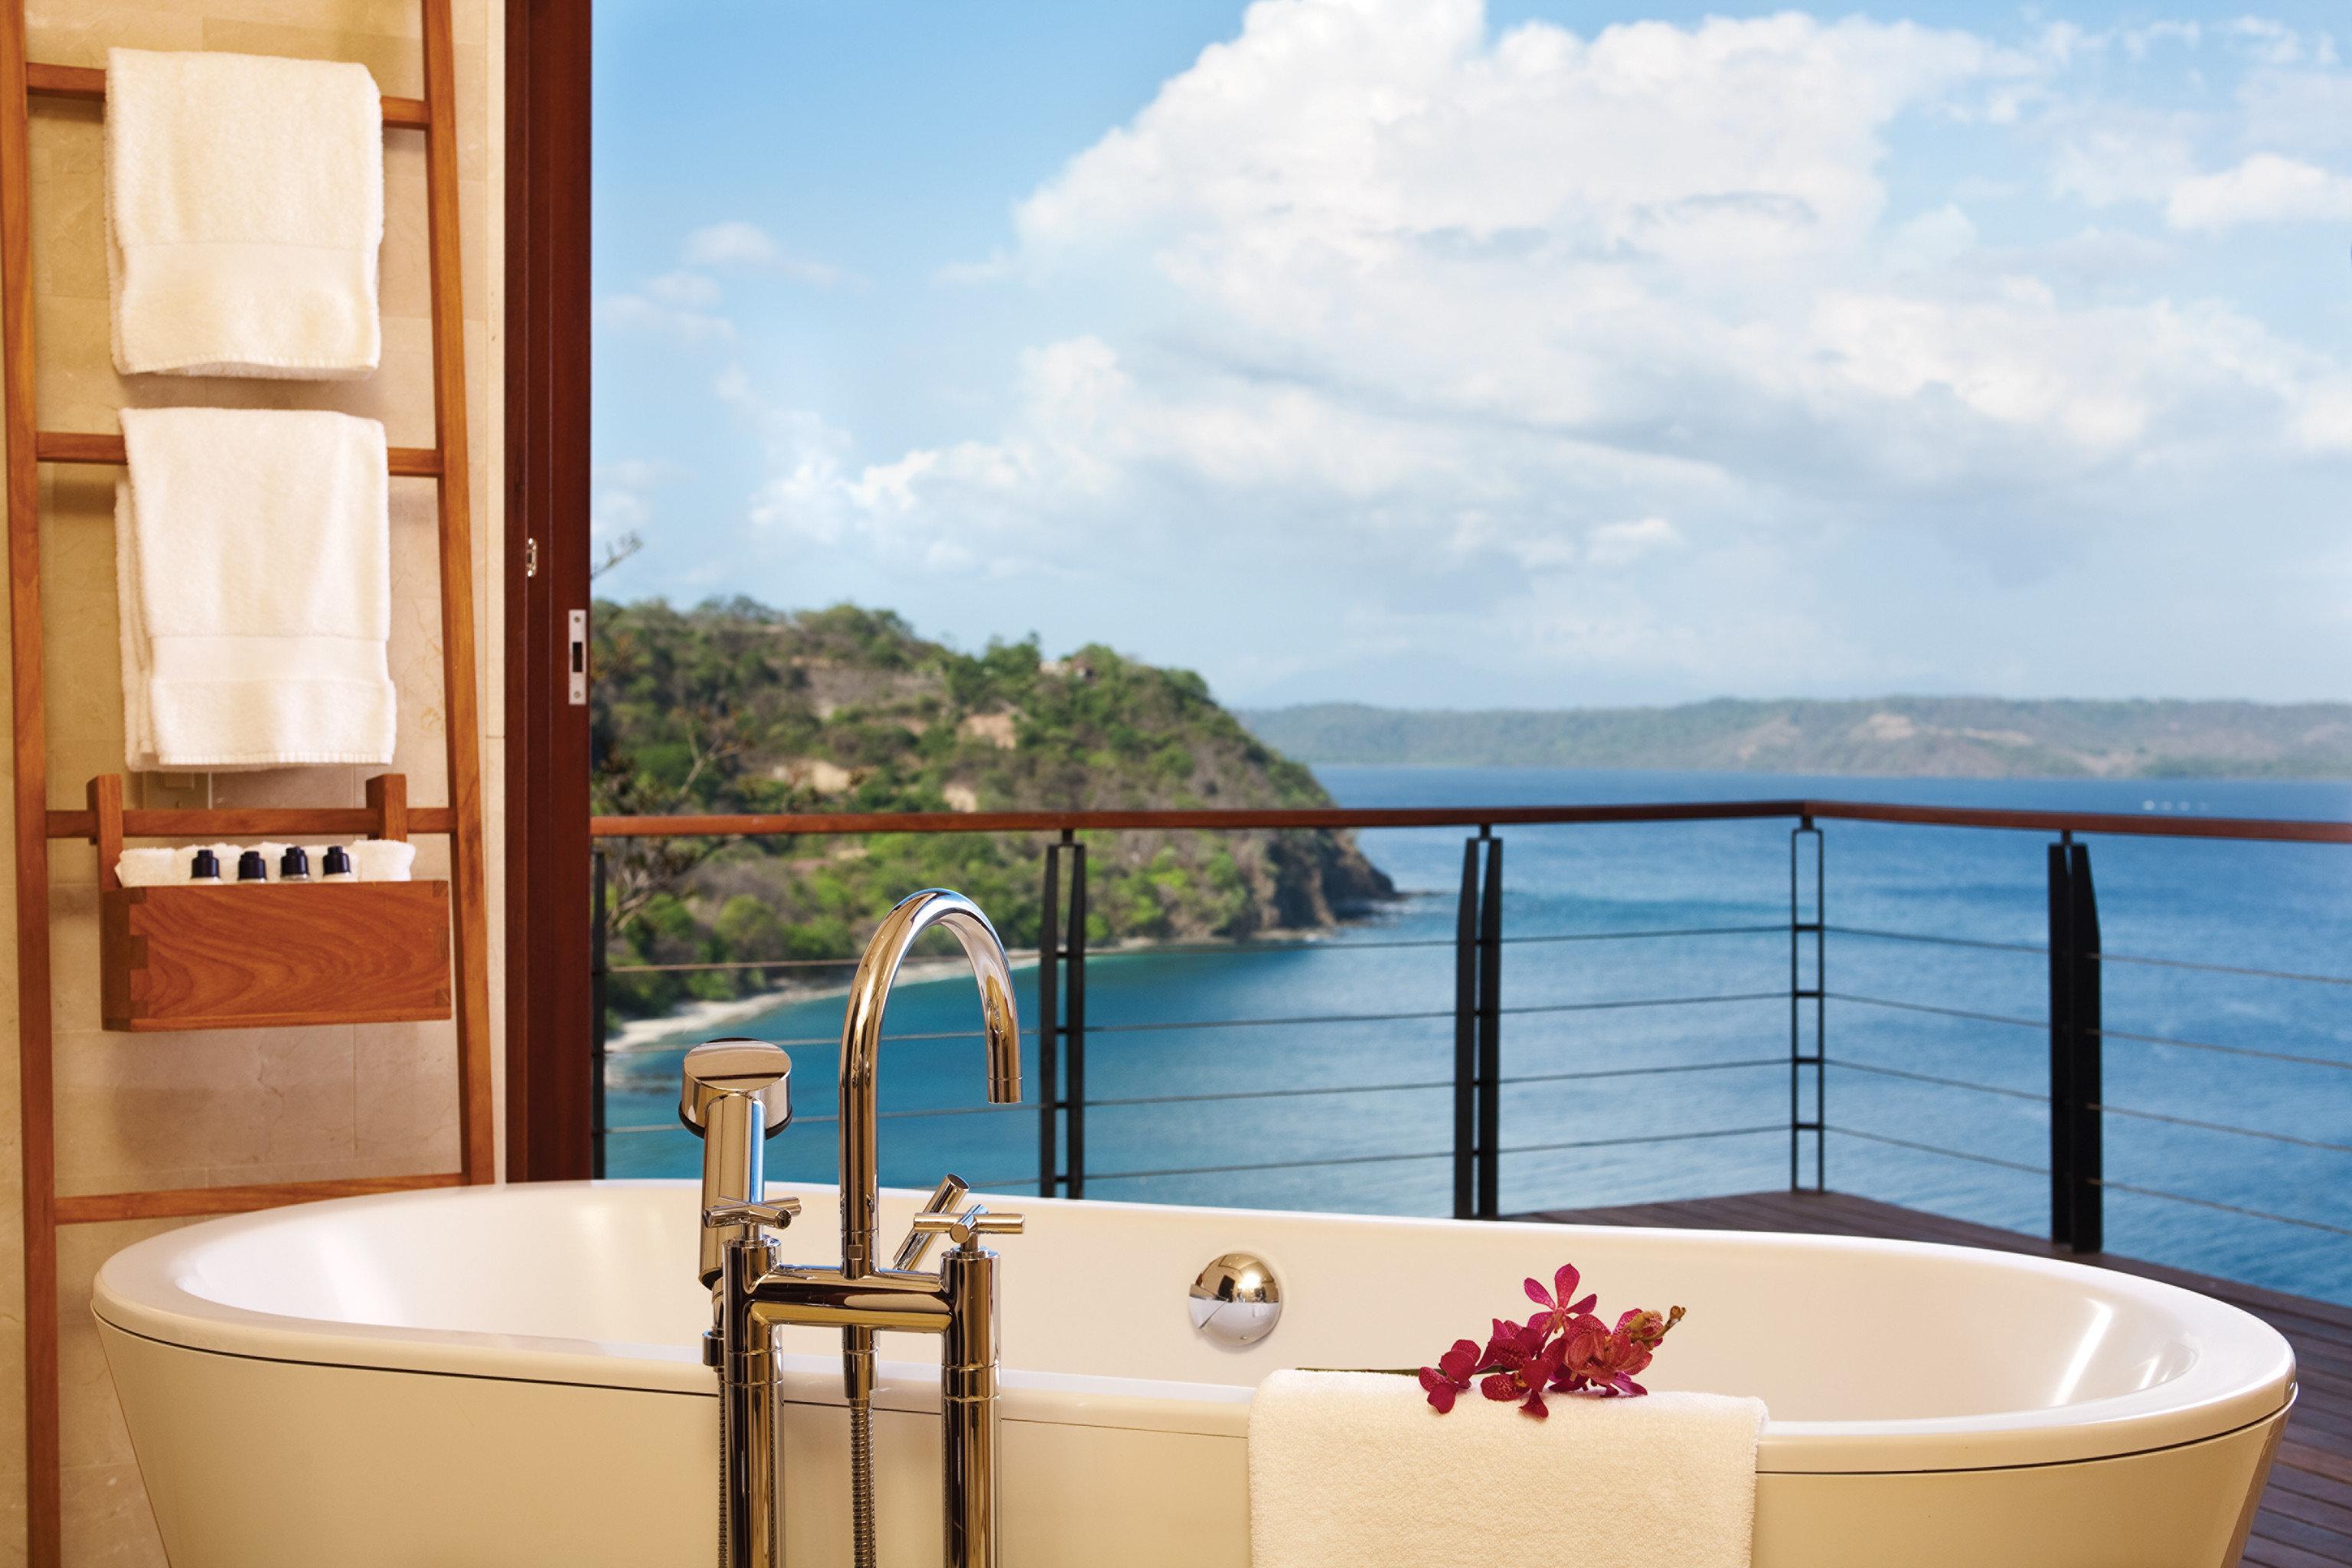 Balcony Bar Elegant Hotels Luxury Ocean Scenic views sky swimming pool room property vacation estate home bathtub jacuzzi interior design apartment Suite tub